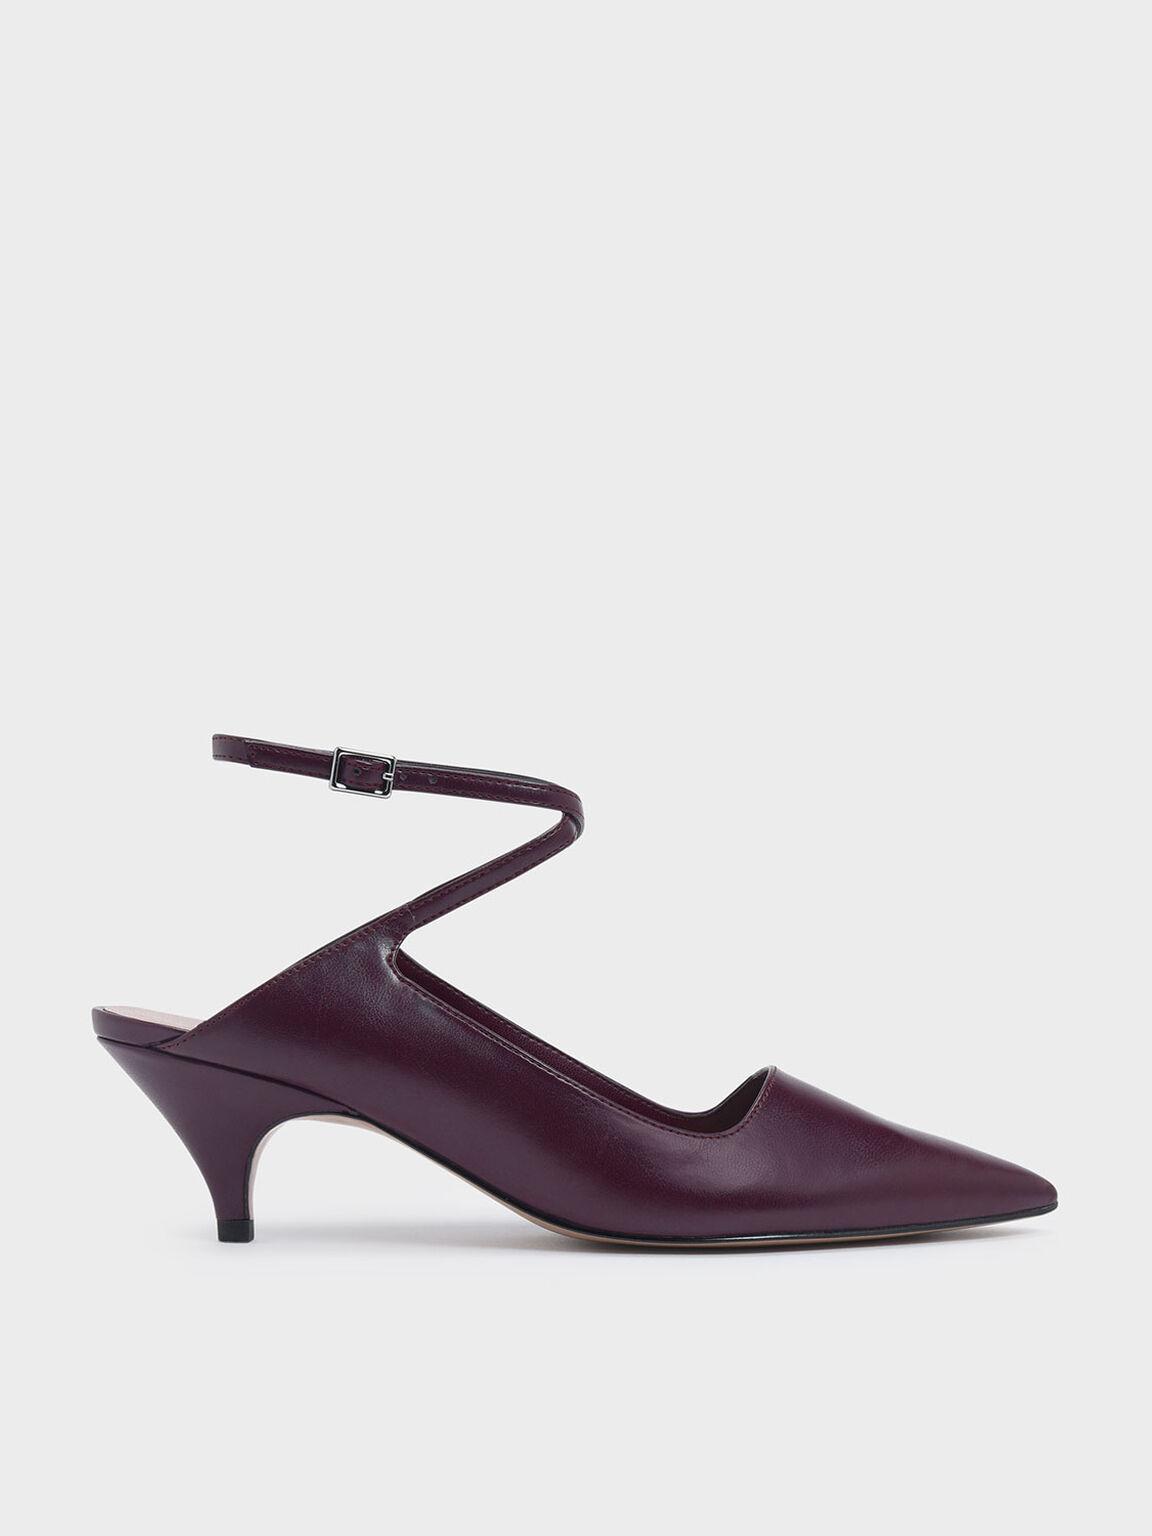 Criss Cross Ankle Strap Kitten Heel Pumps, Purple, hi-res